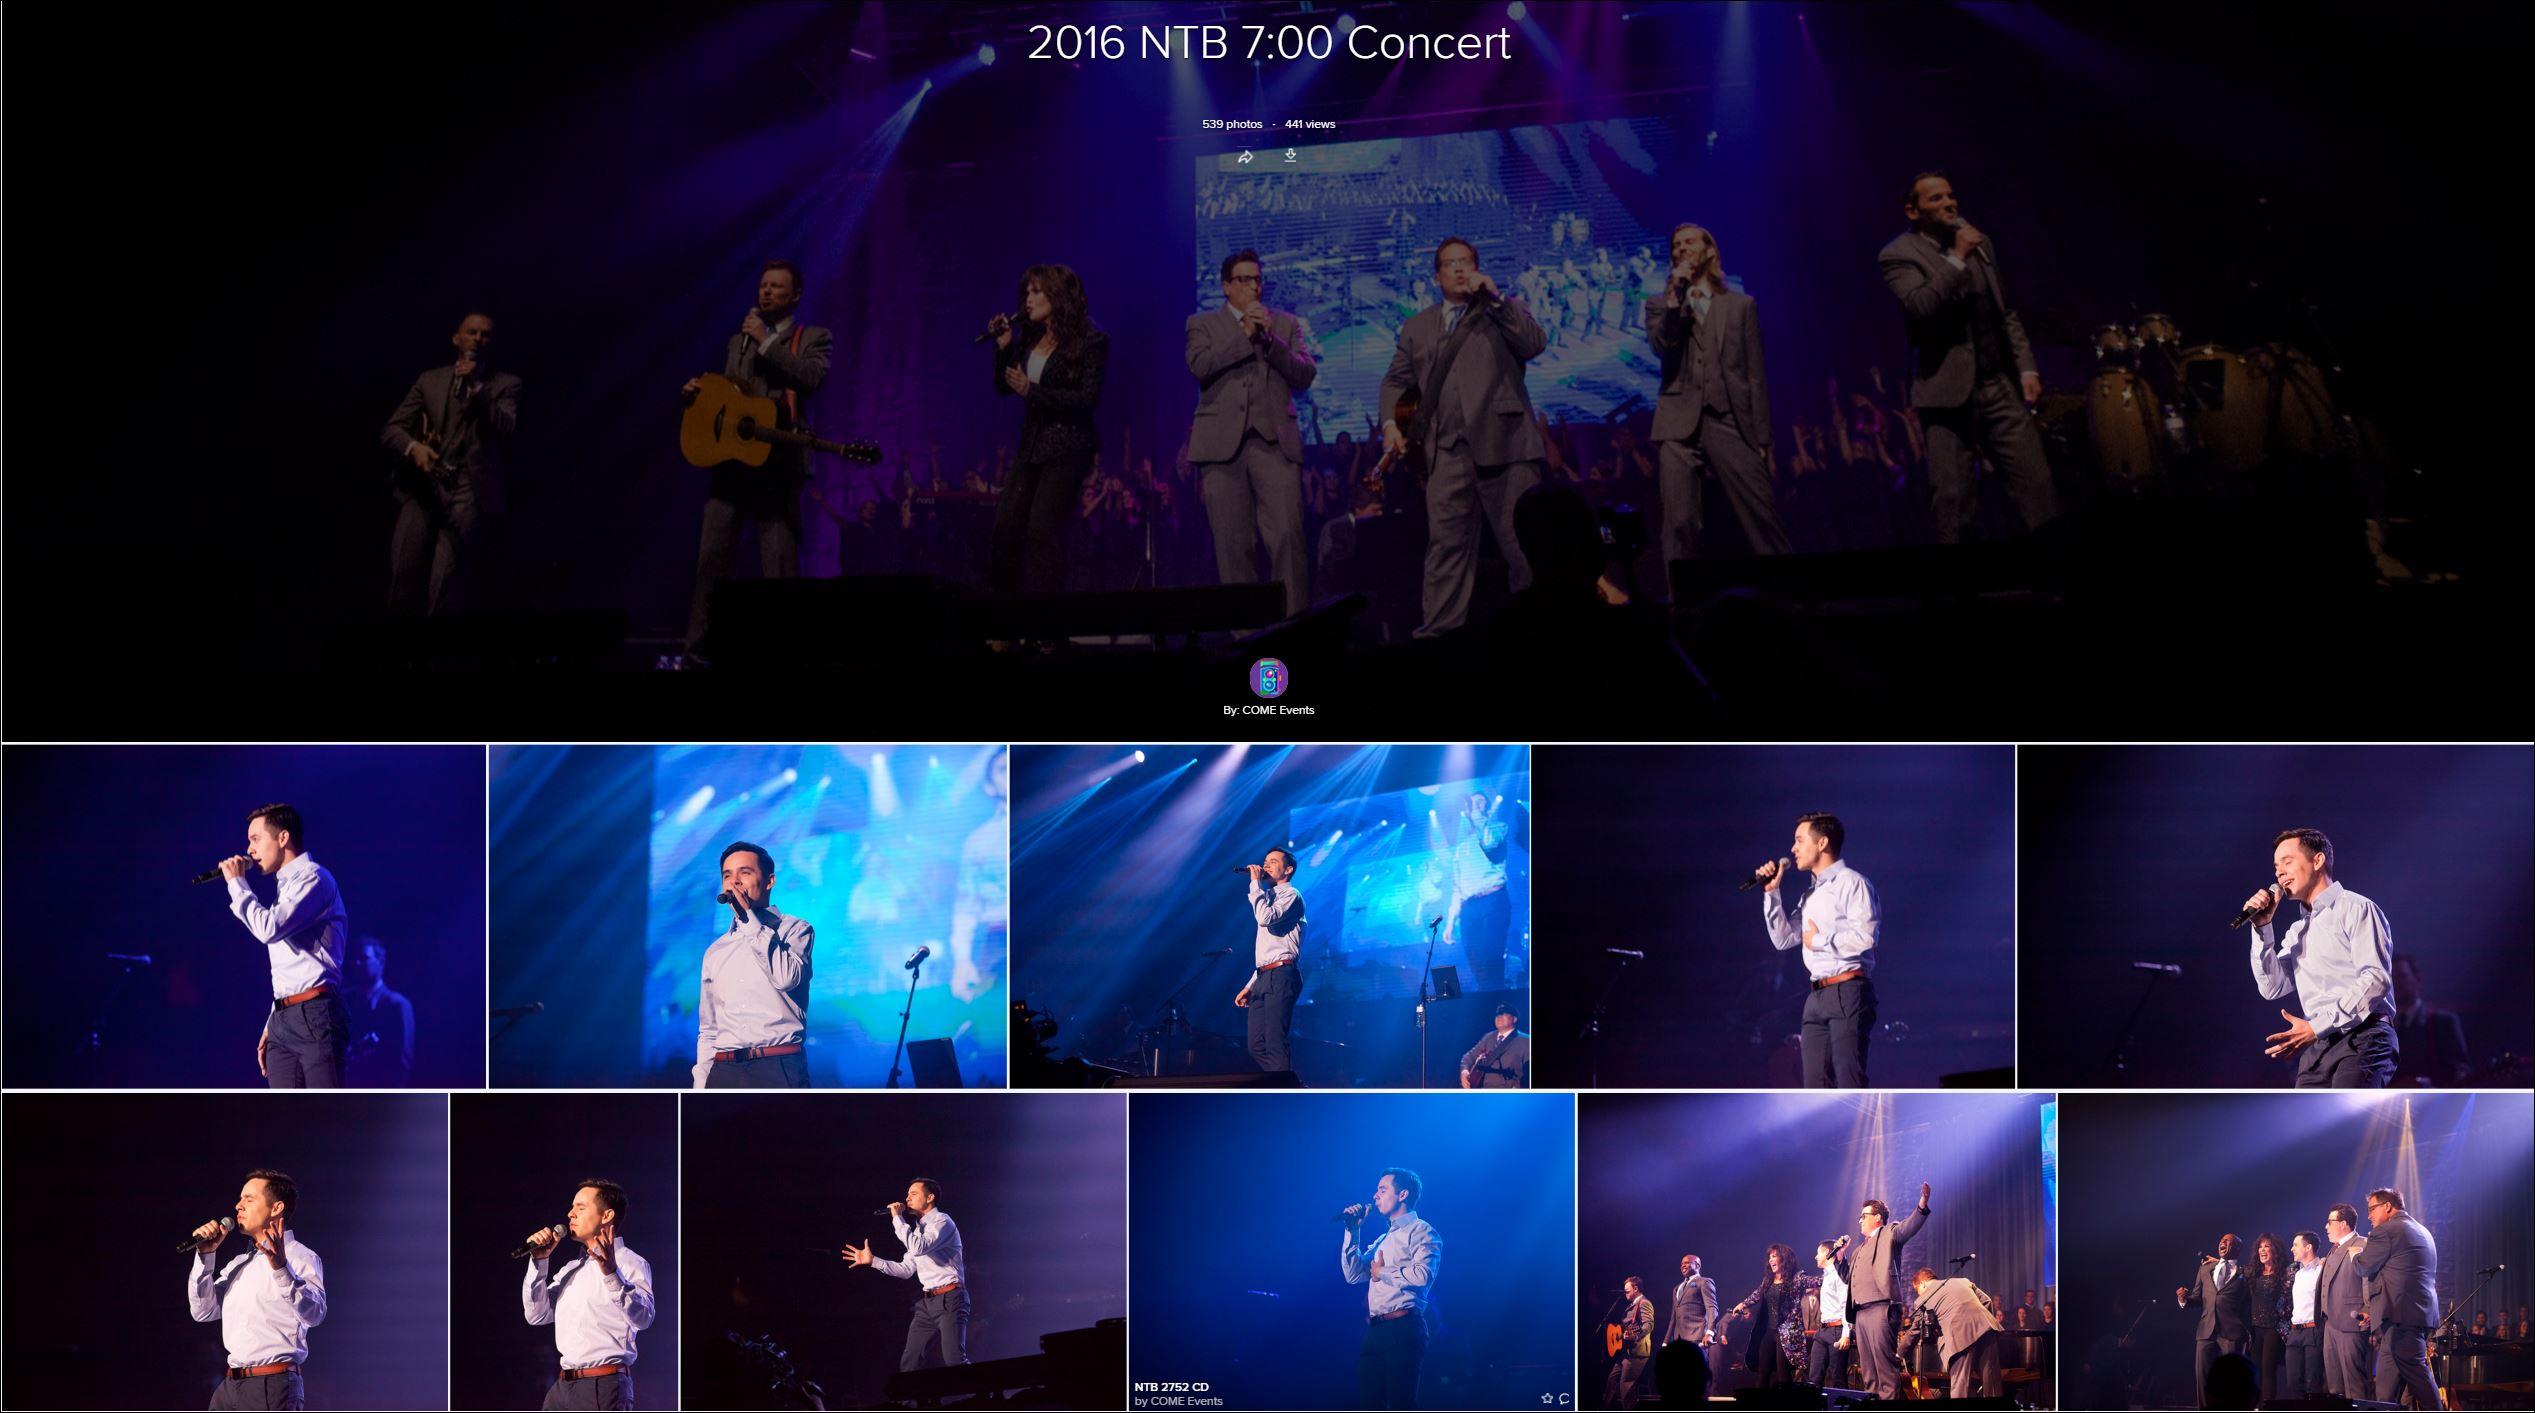 NTB 2016 19: 00 konser